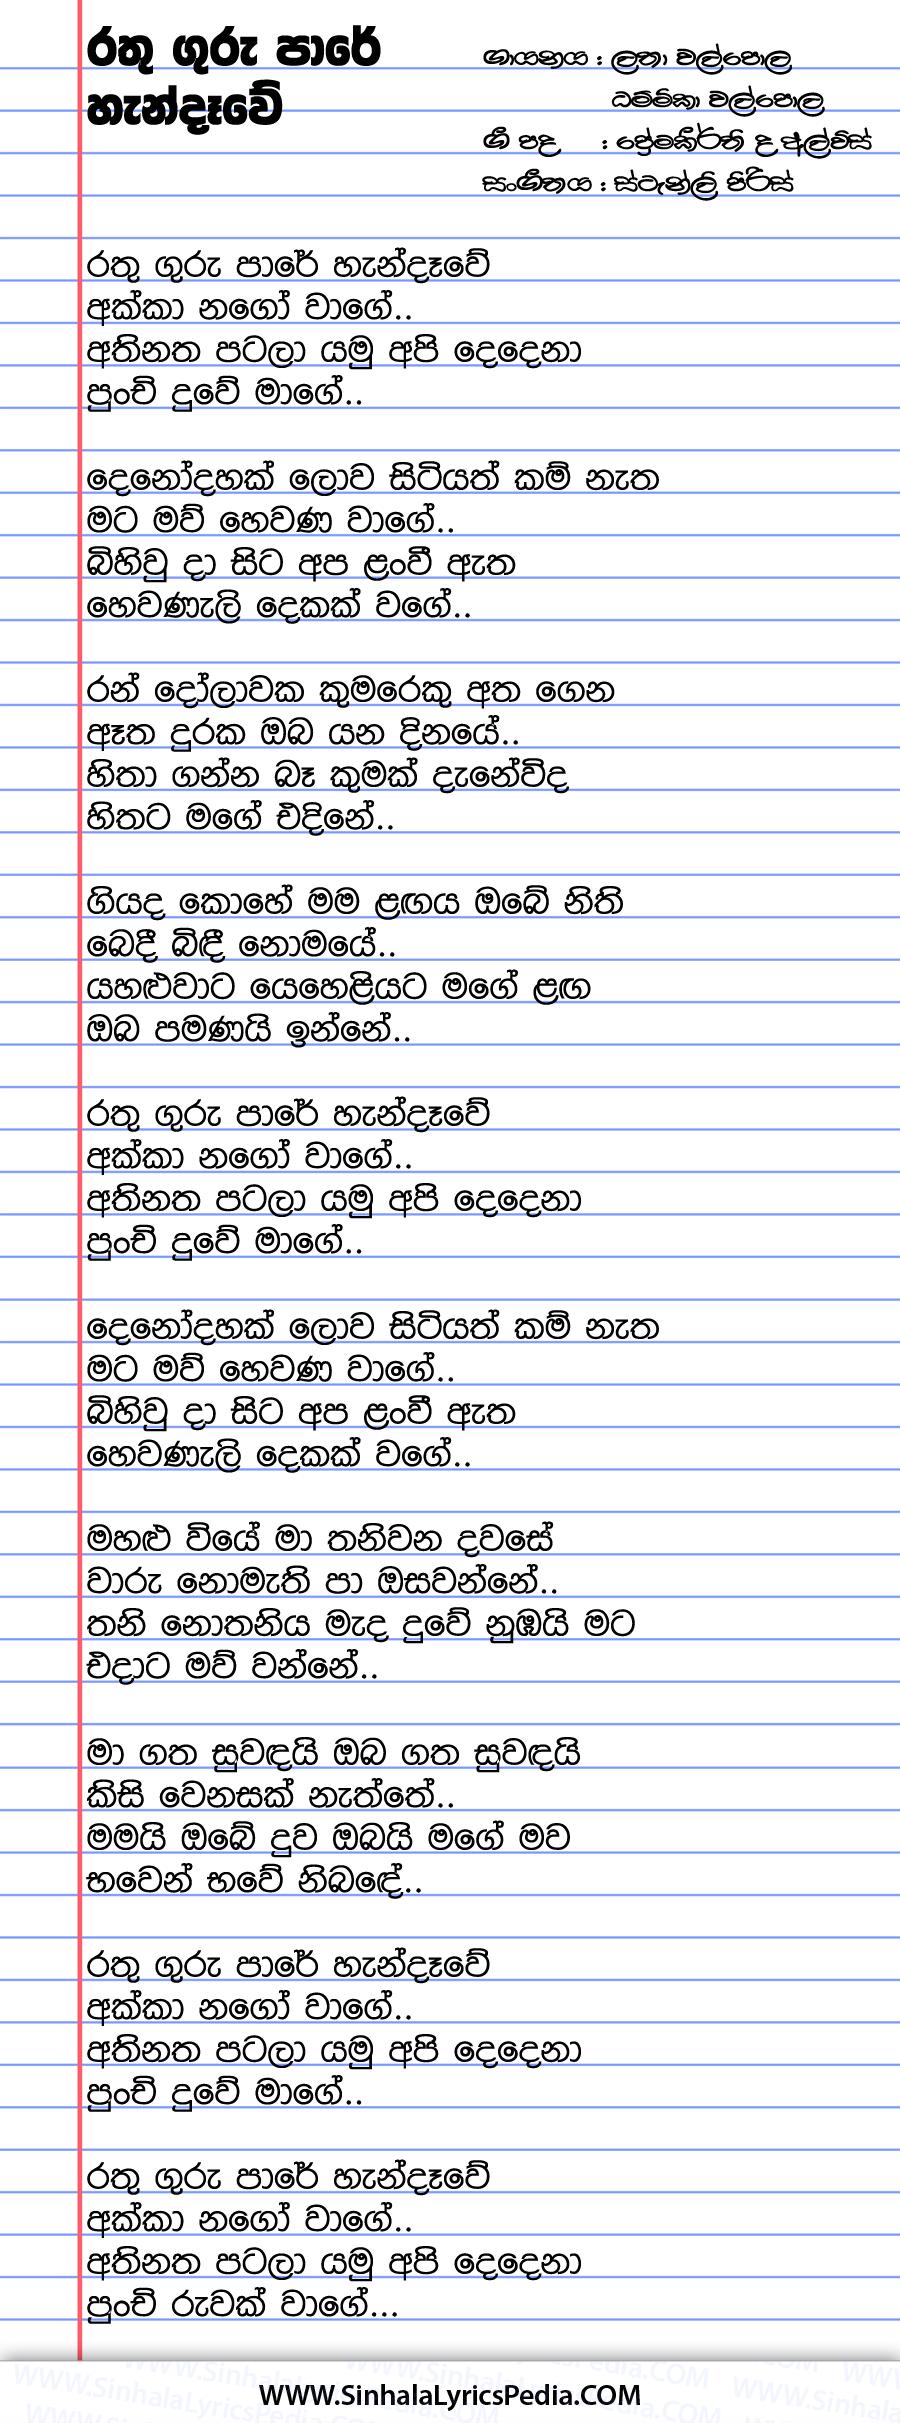 Rathu Guru Pare Handawe Song Lyrics